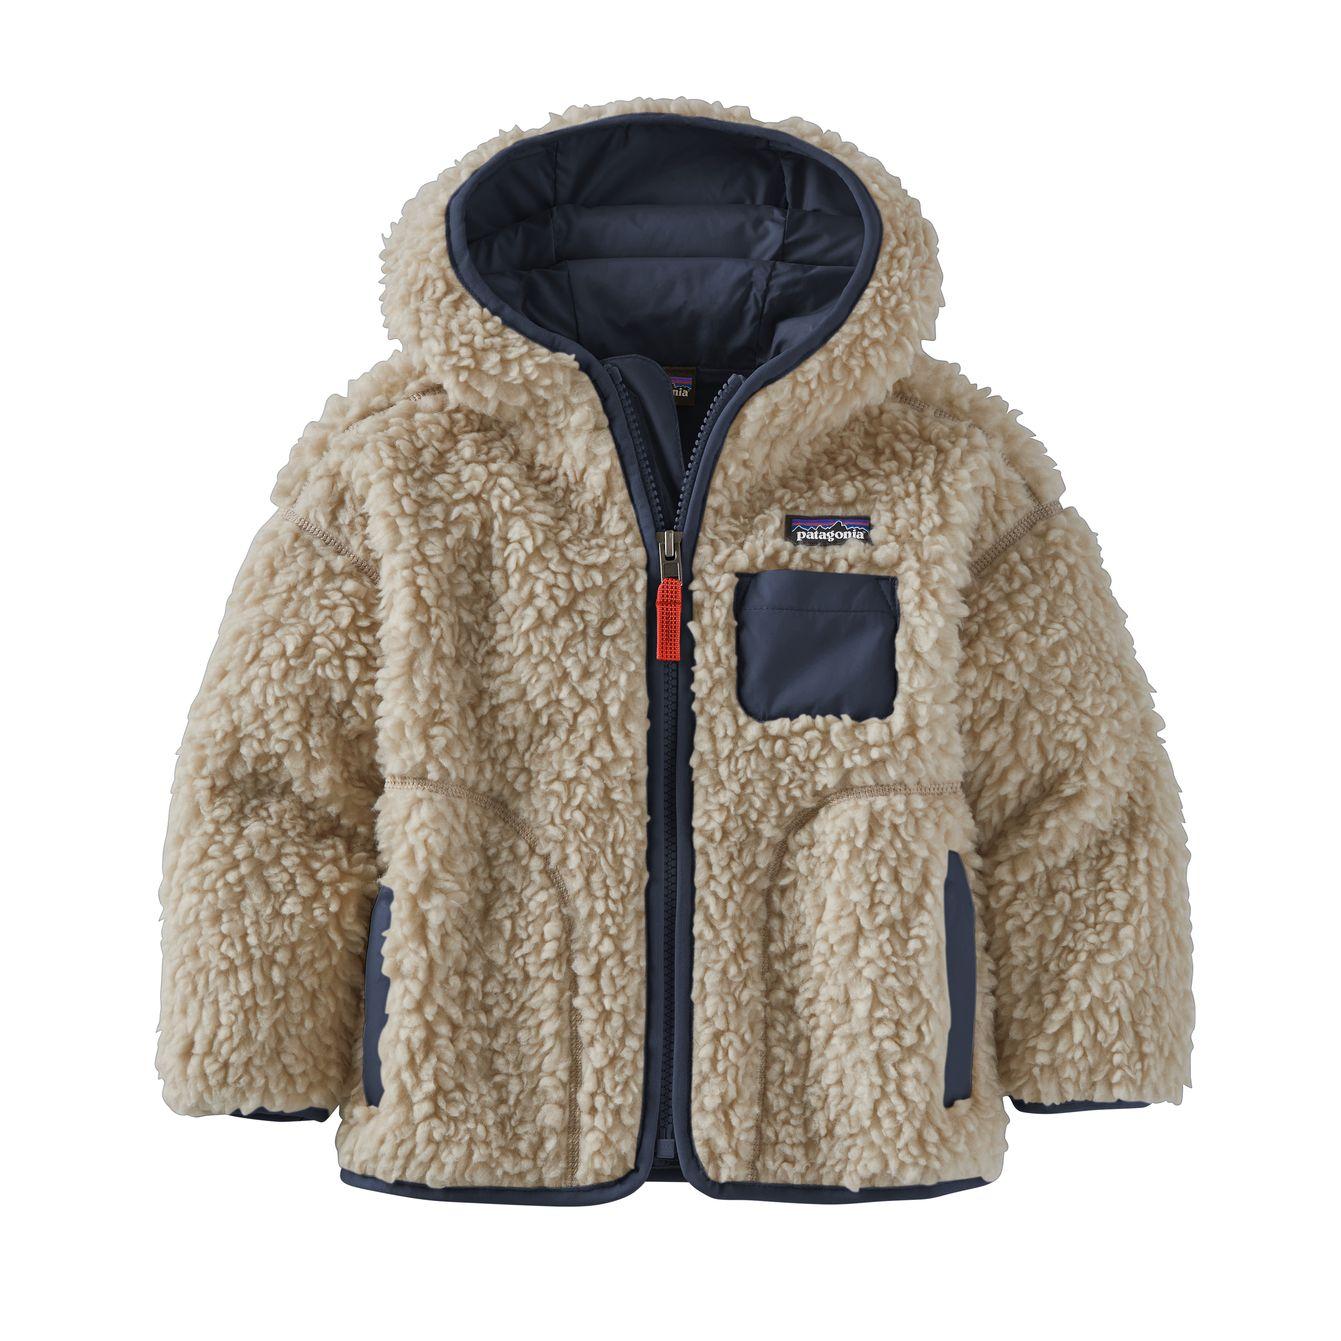 Patagonia Baby Retro-X Hoody - Fleece jacket - Kids